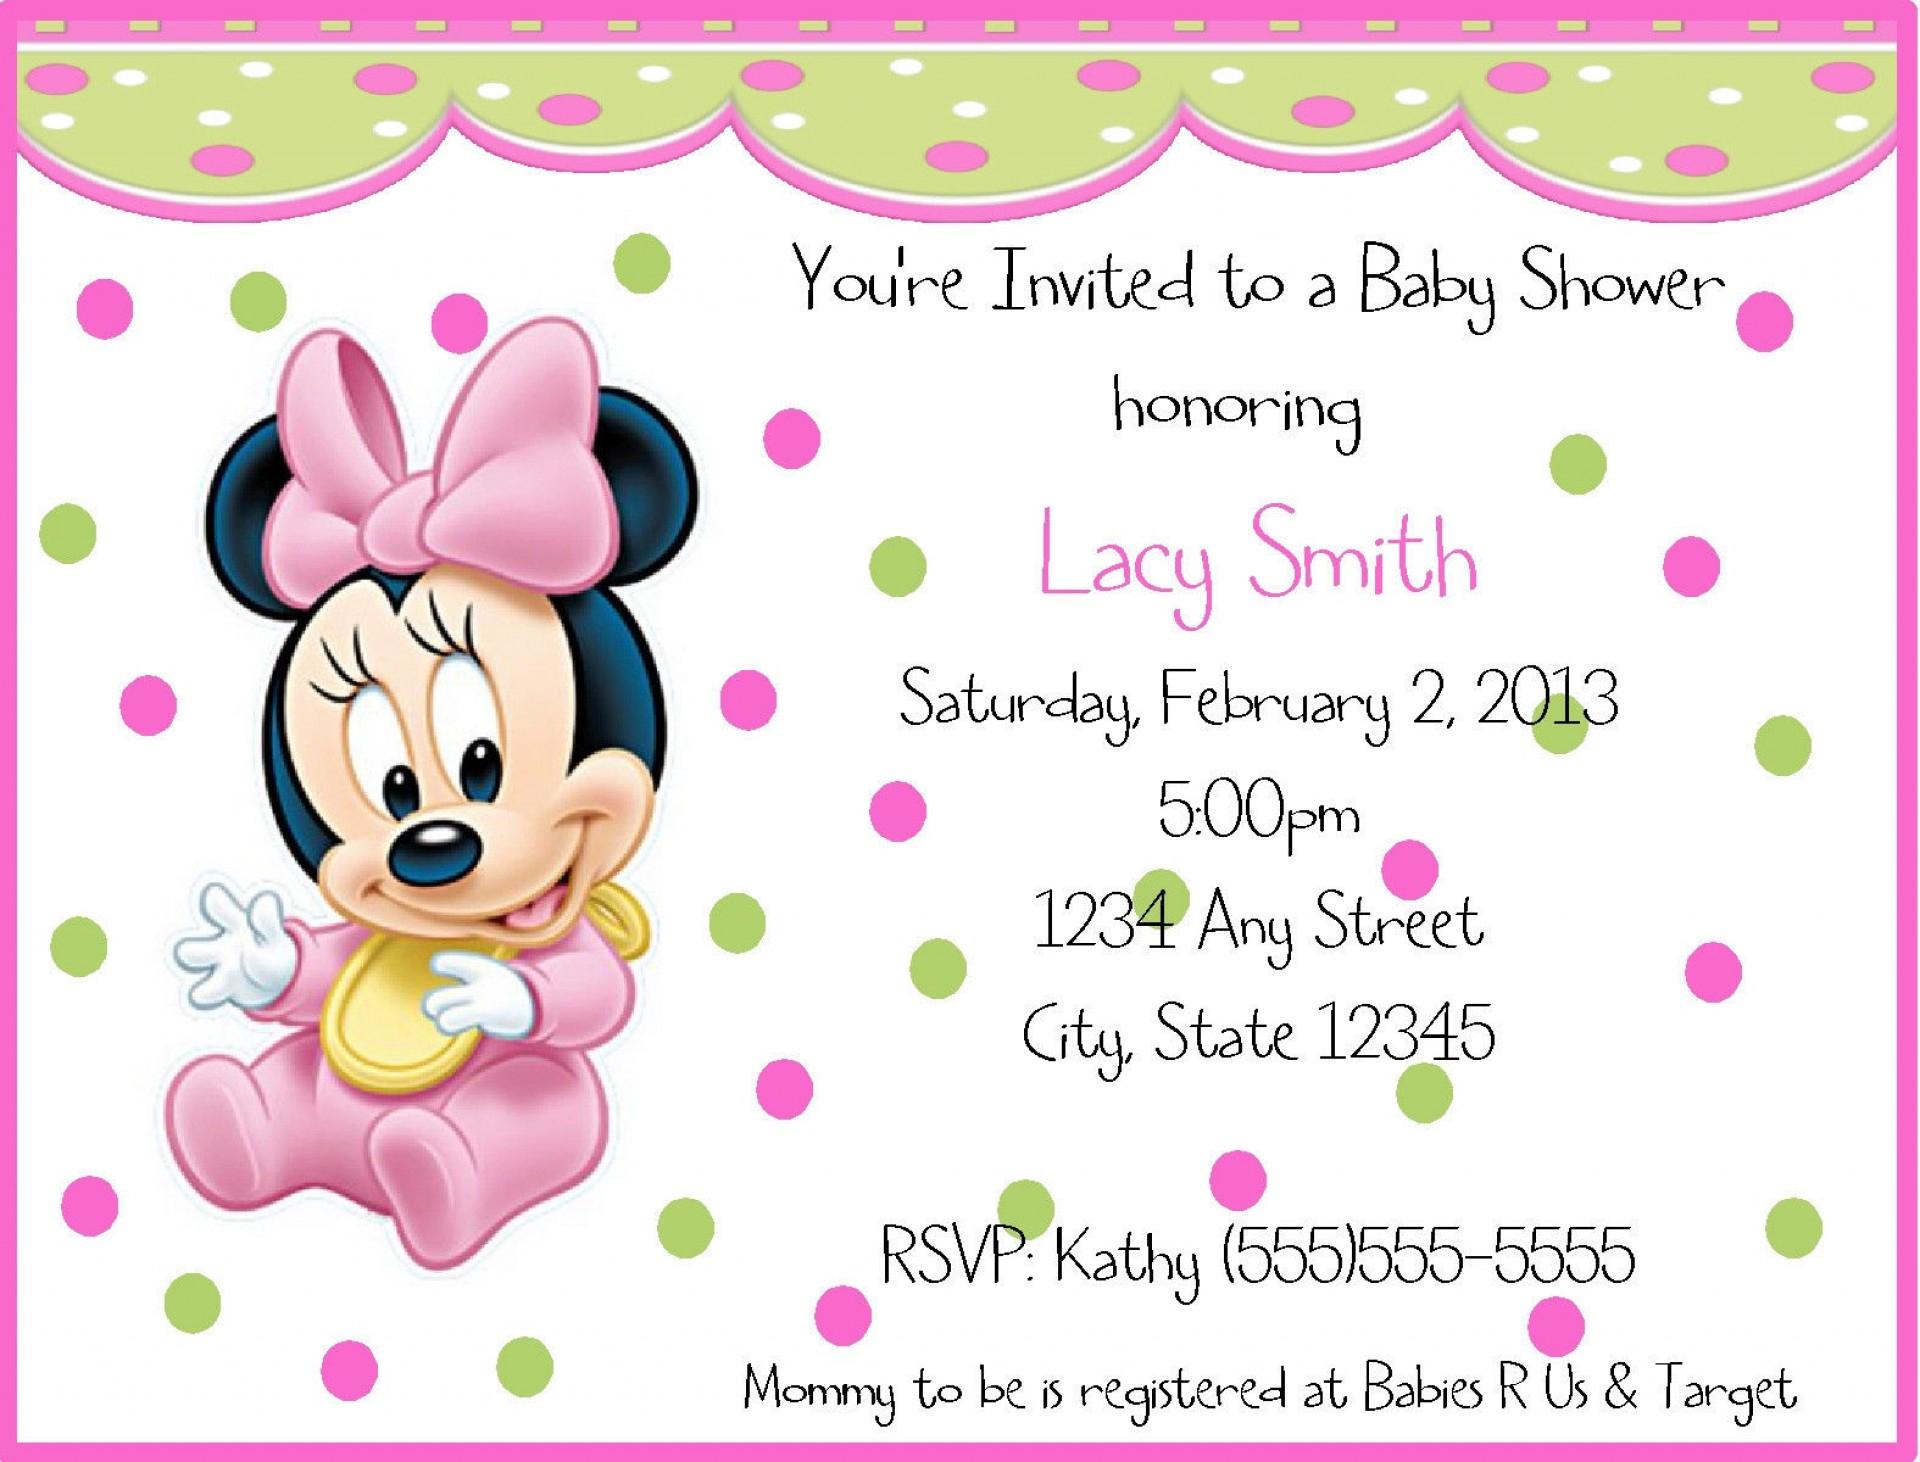 016 Minnie Mouse Birthday Invitation Template Ideas Baby ~ Ulyssesroom - Free Printable Baby Mickey Mouse Birthday Invitations